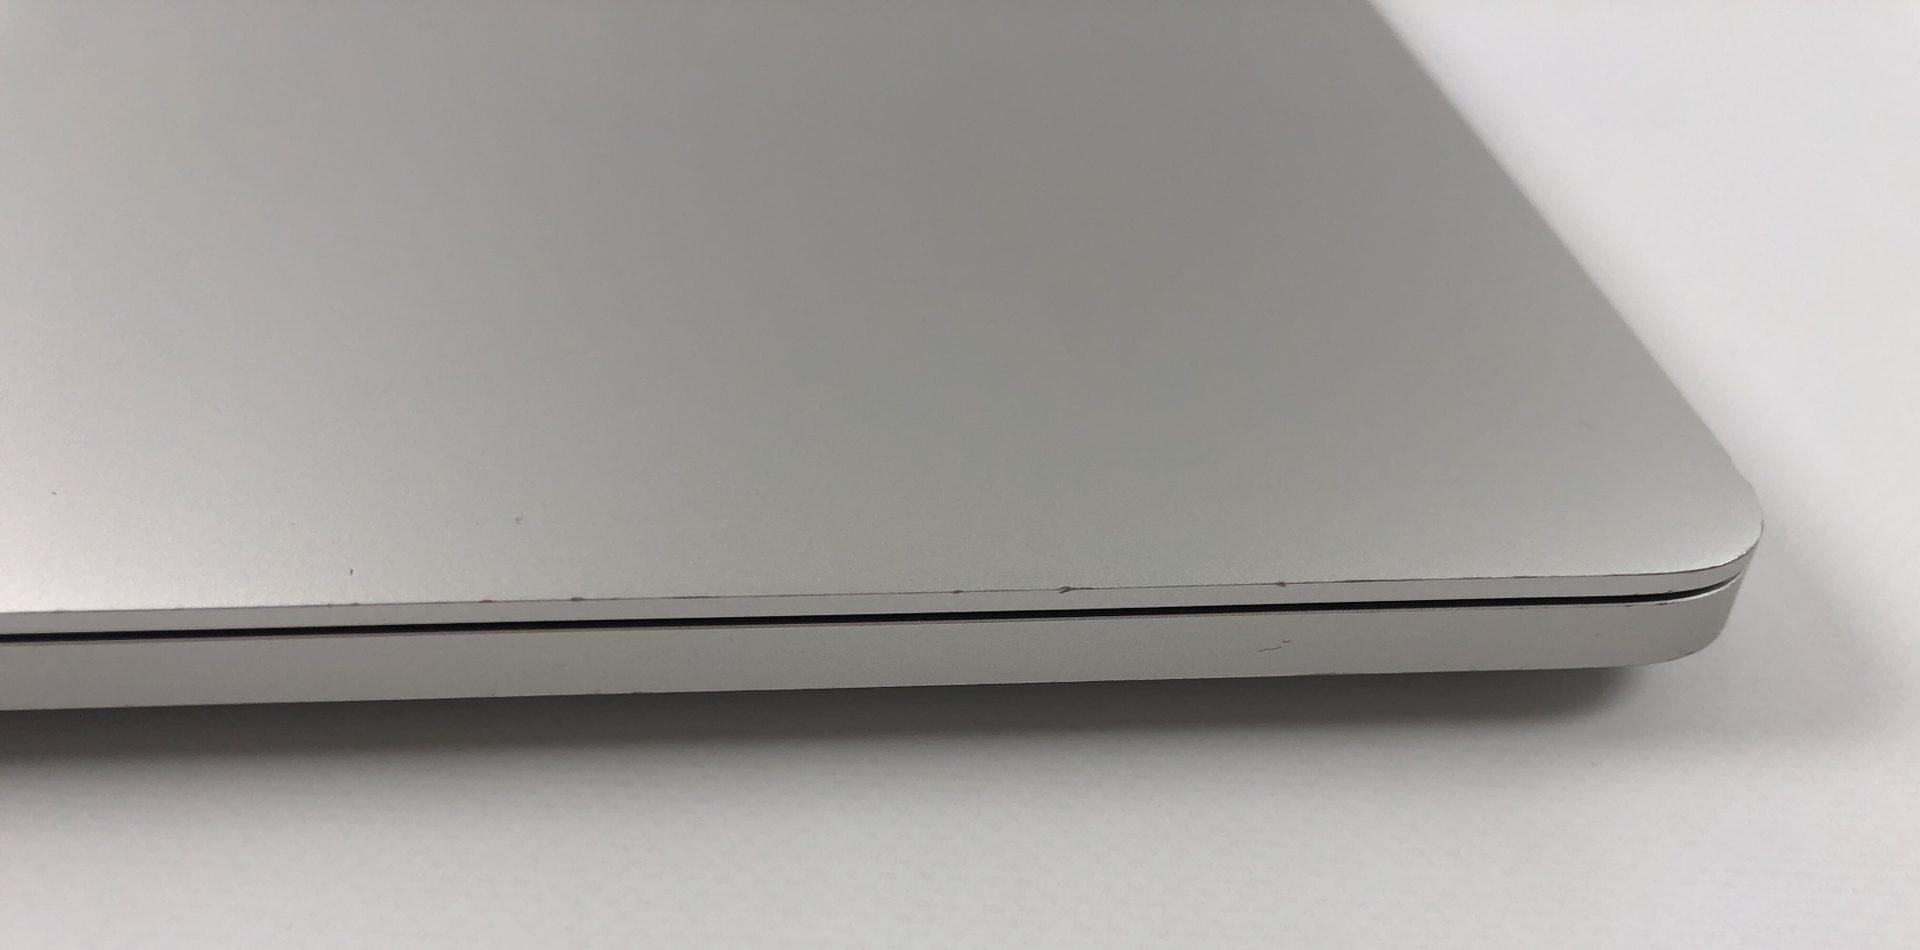 "MacBook Pro 15"" Touch Bar Late 2016 (Intel Quad-Core i7 2.7 GHz 16 GB RAM 512 GB SSD), Silver, Intel Quad-Core i7 2.7 GHz, 16 GB RAM, 512 GB SSD, imagen 4"